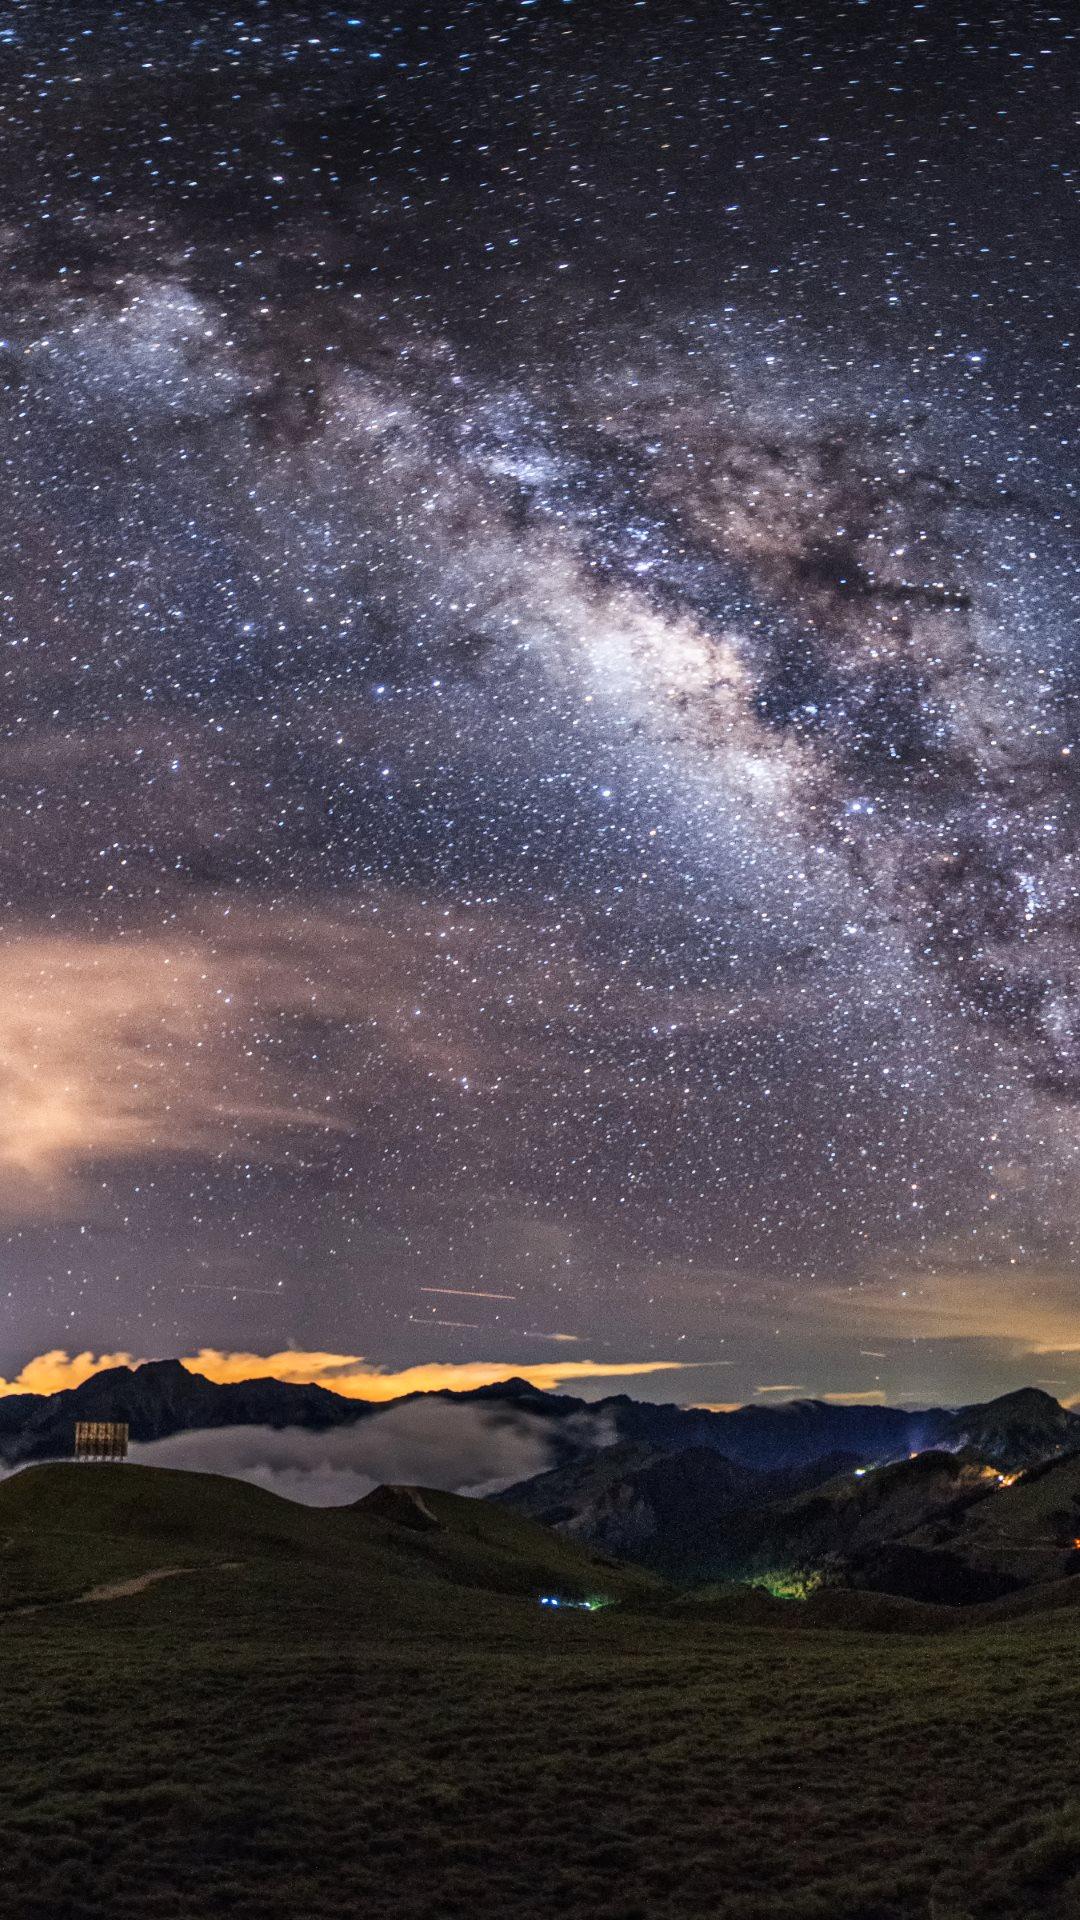 Hd wallpaper for smartphone - 4k Hd Wallpaper Milky Way On The Night Sky